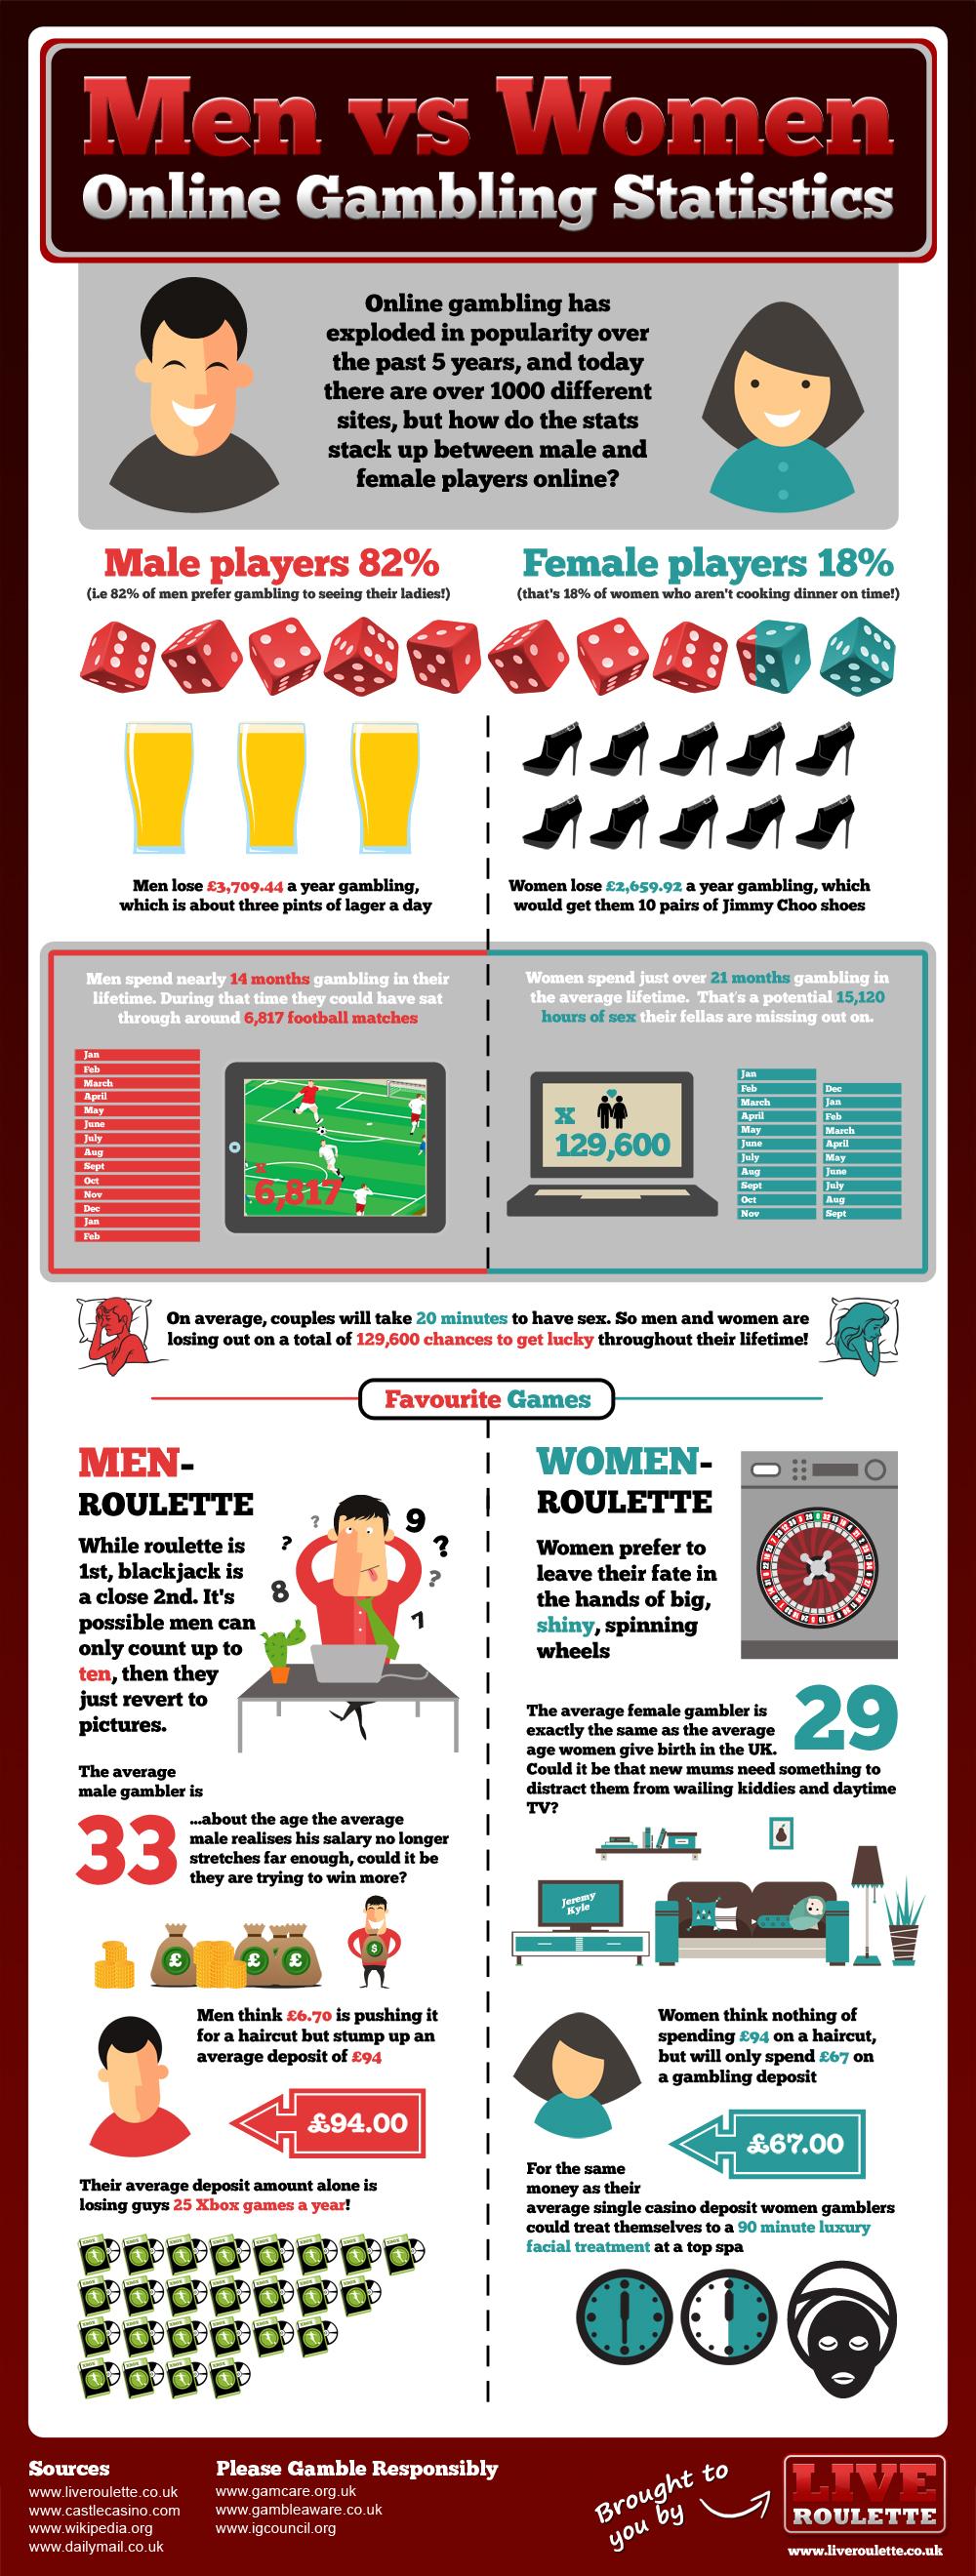 Men vs Women Online Gambling Statistics